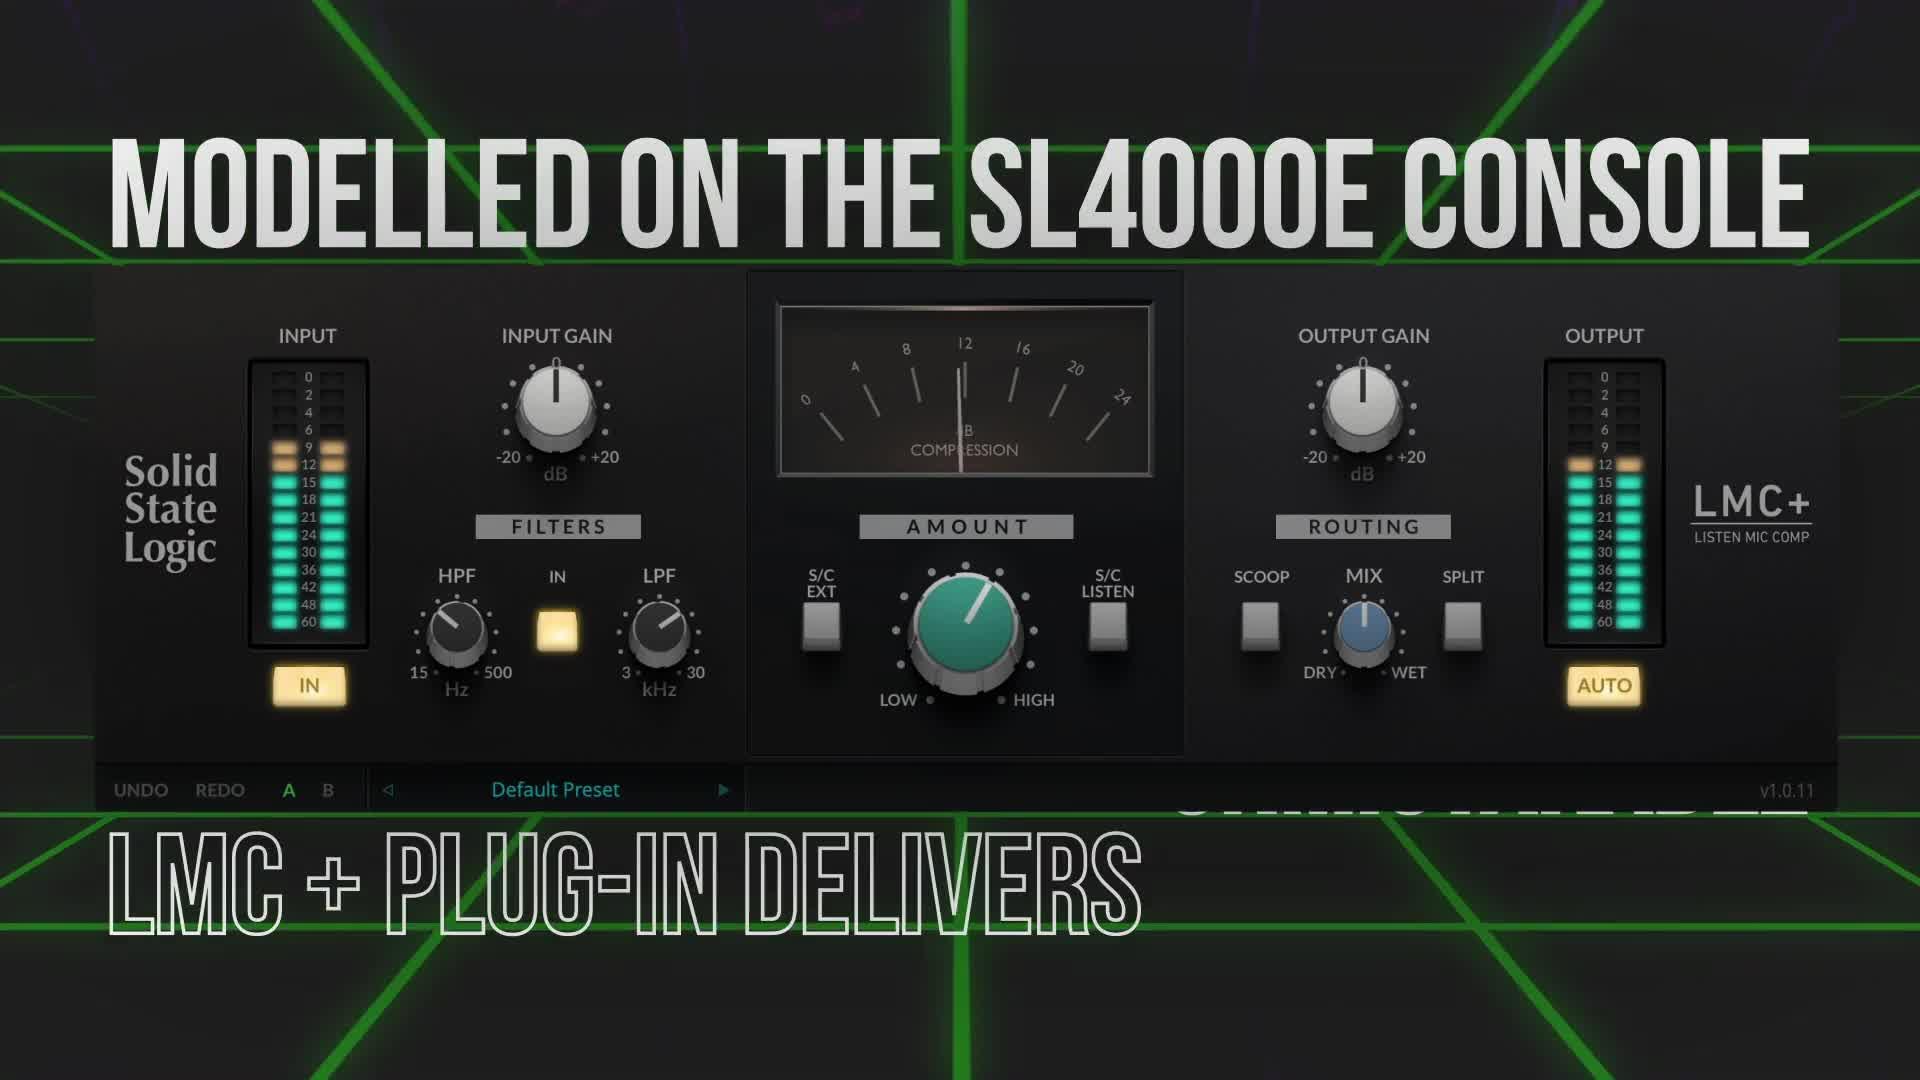 New SSL LMC+ Plug-in